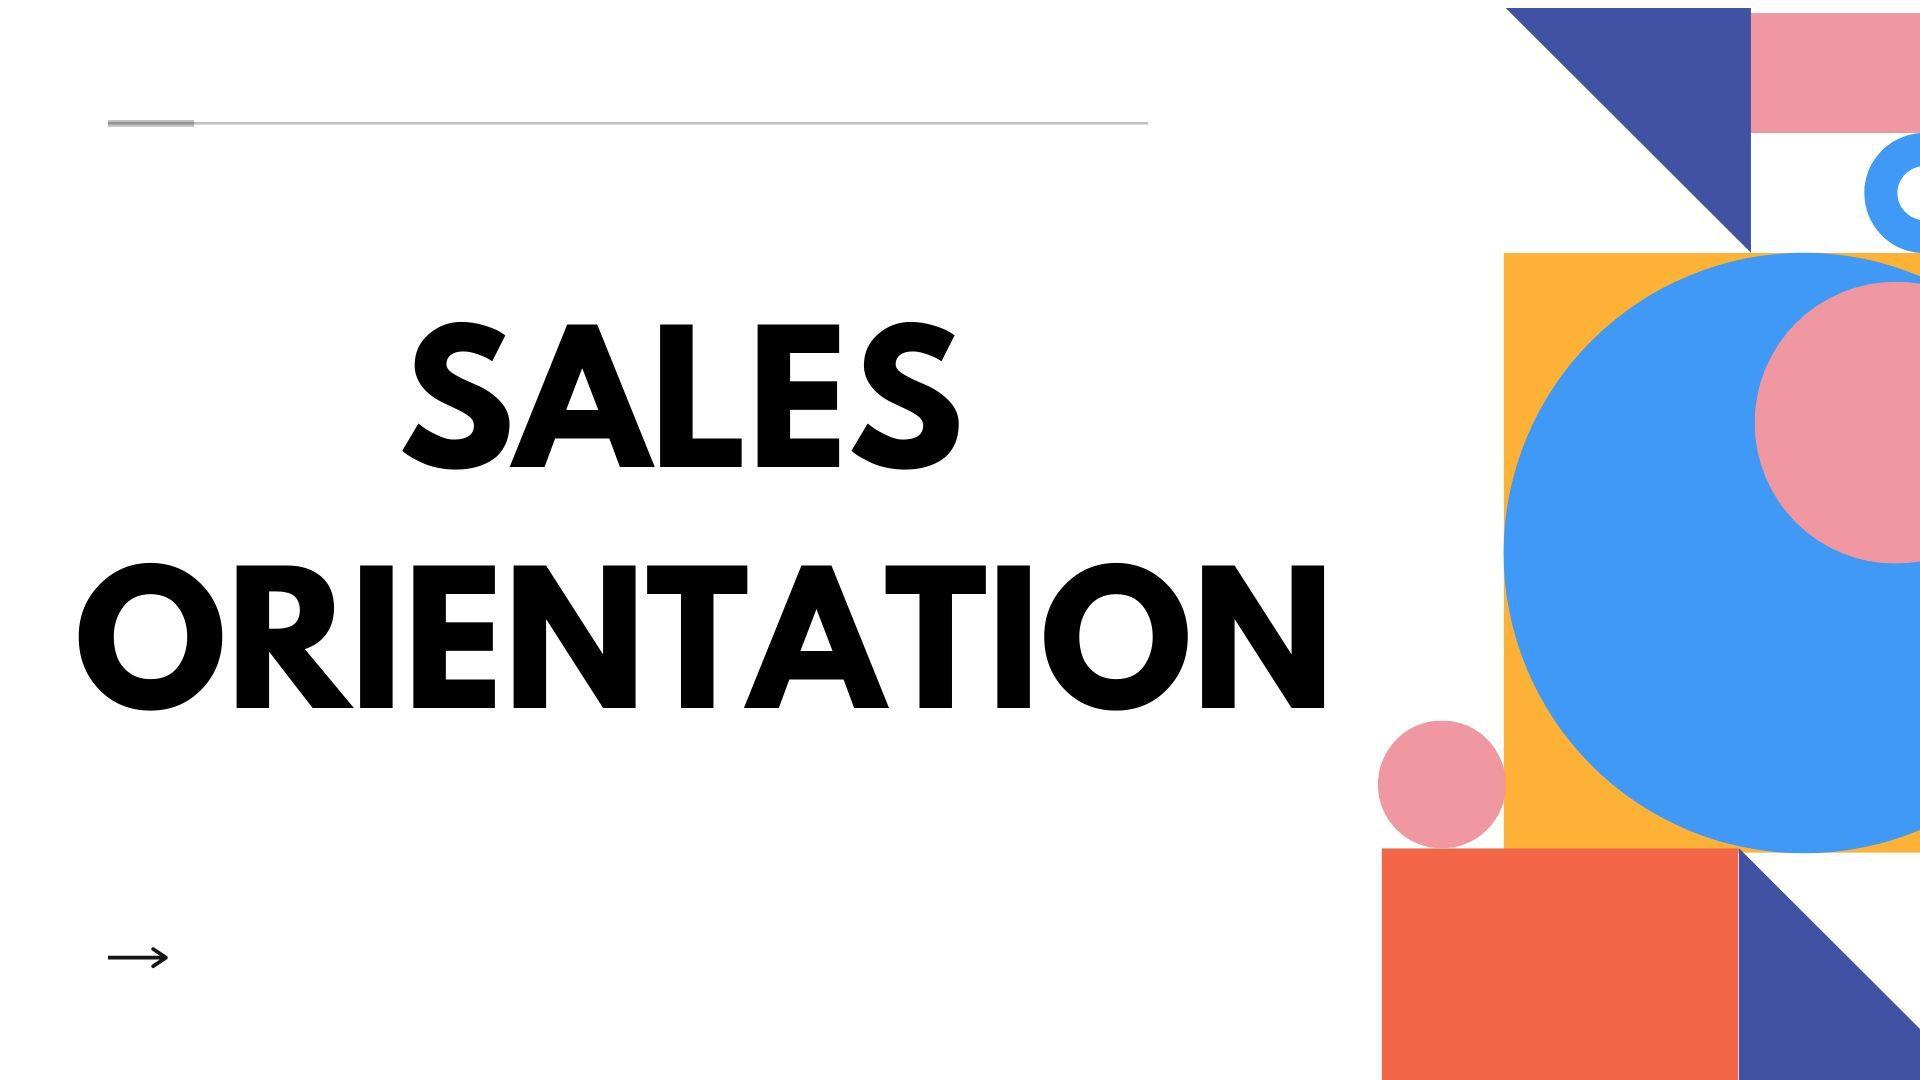 Sales orientation